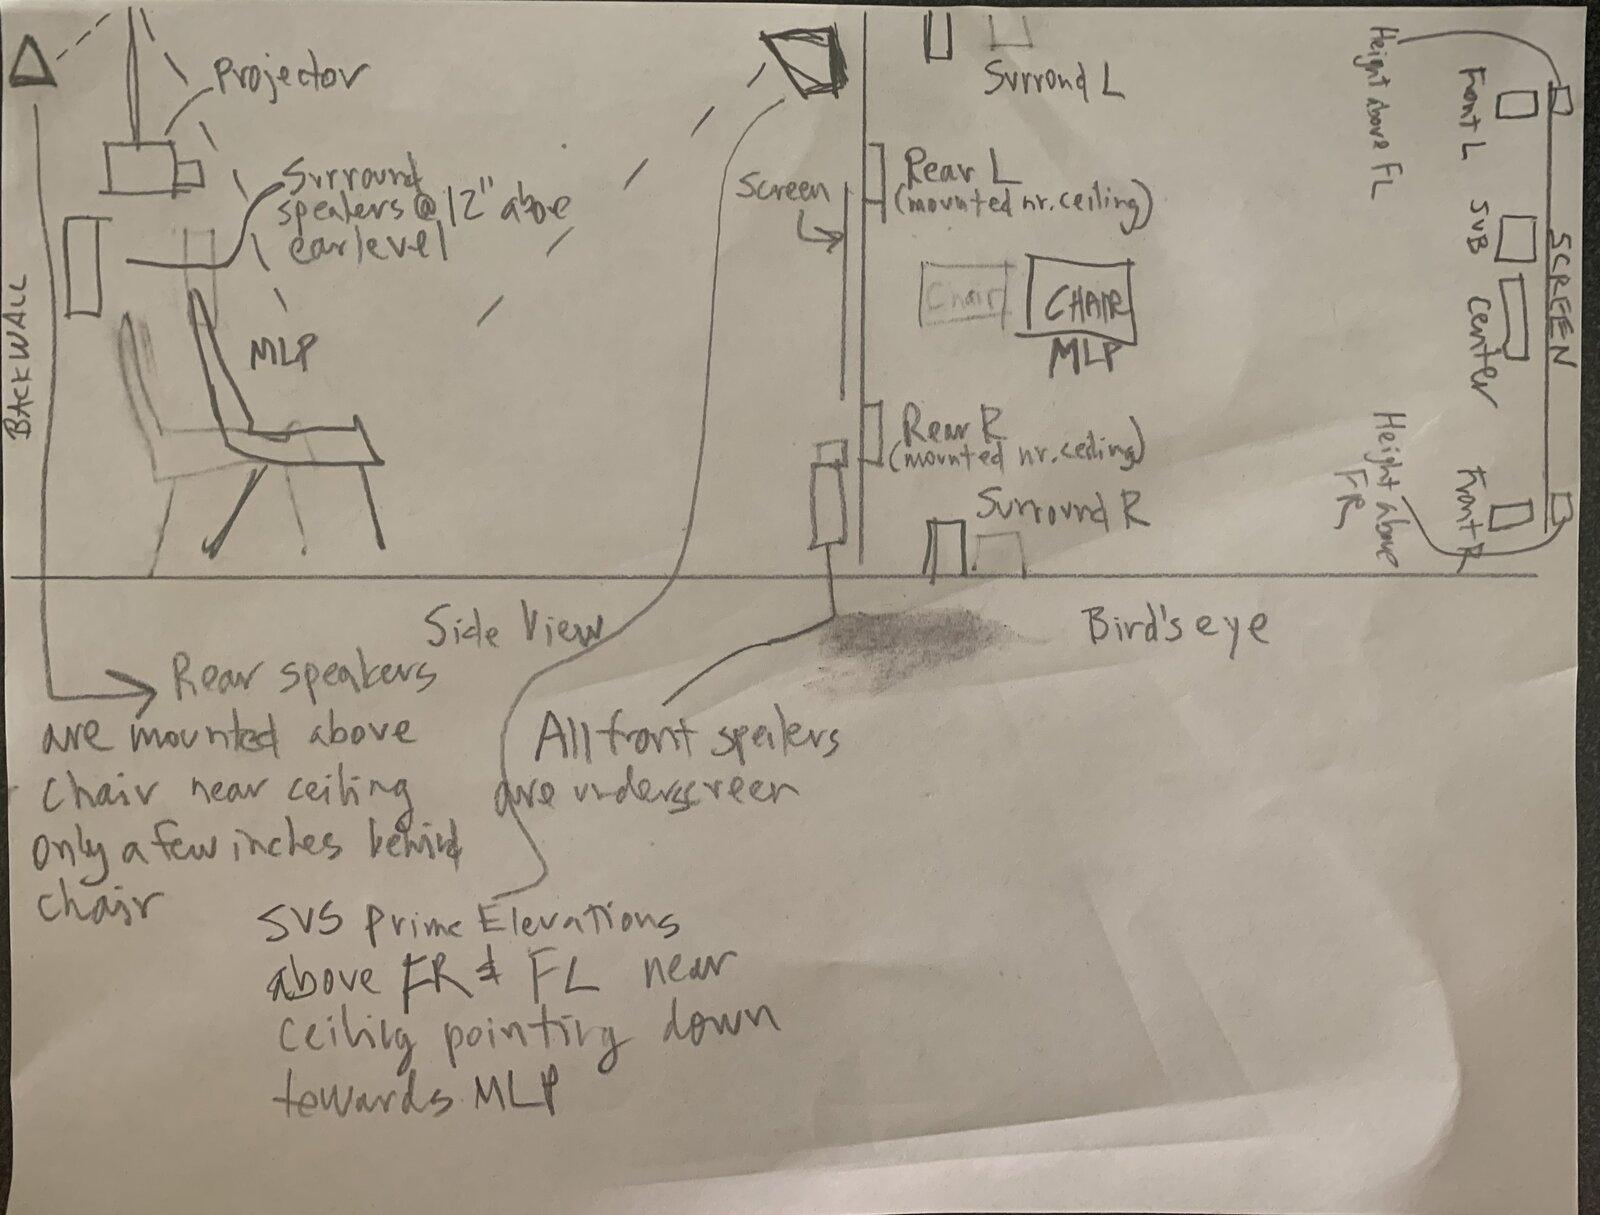 HT w:Primes drawing.jpg